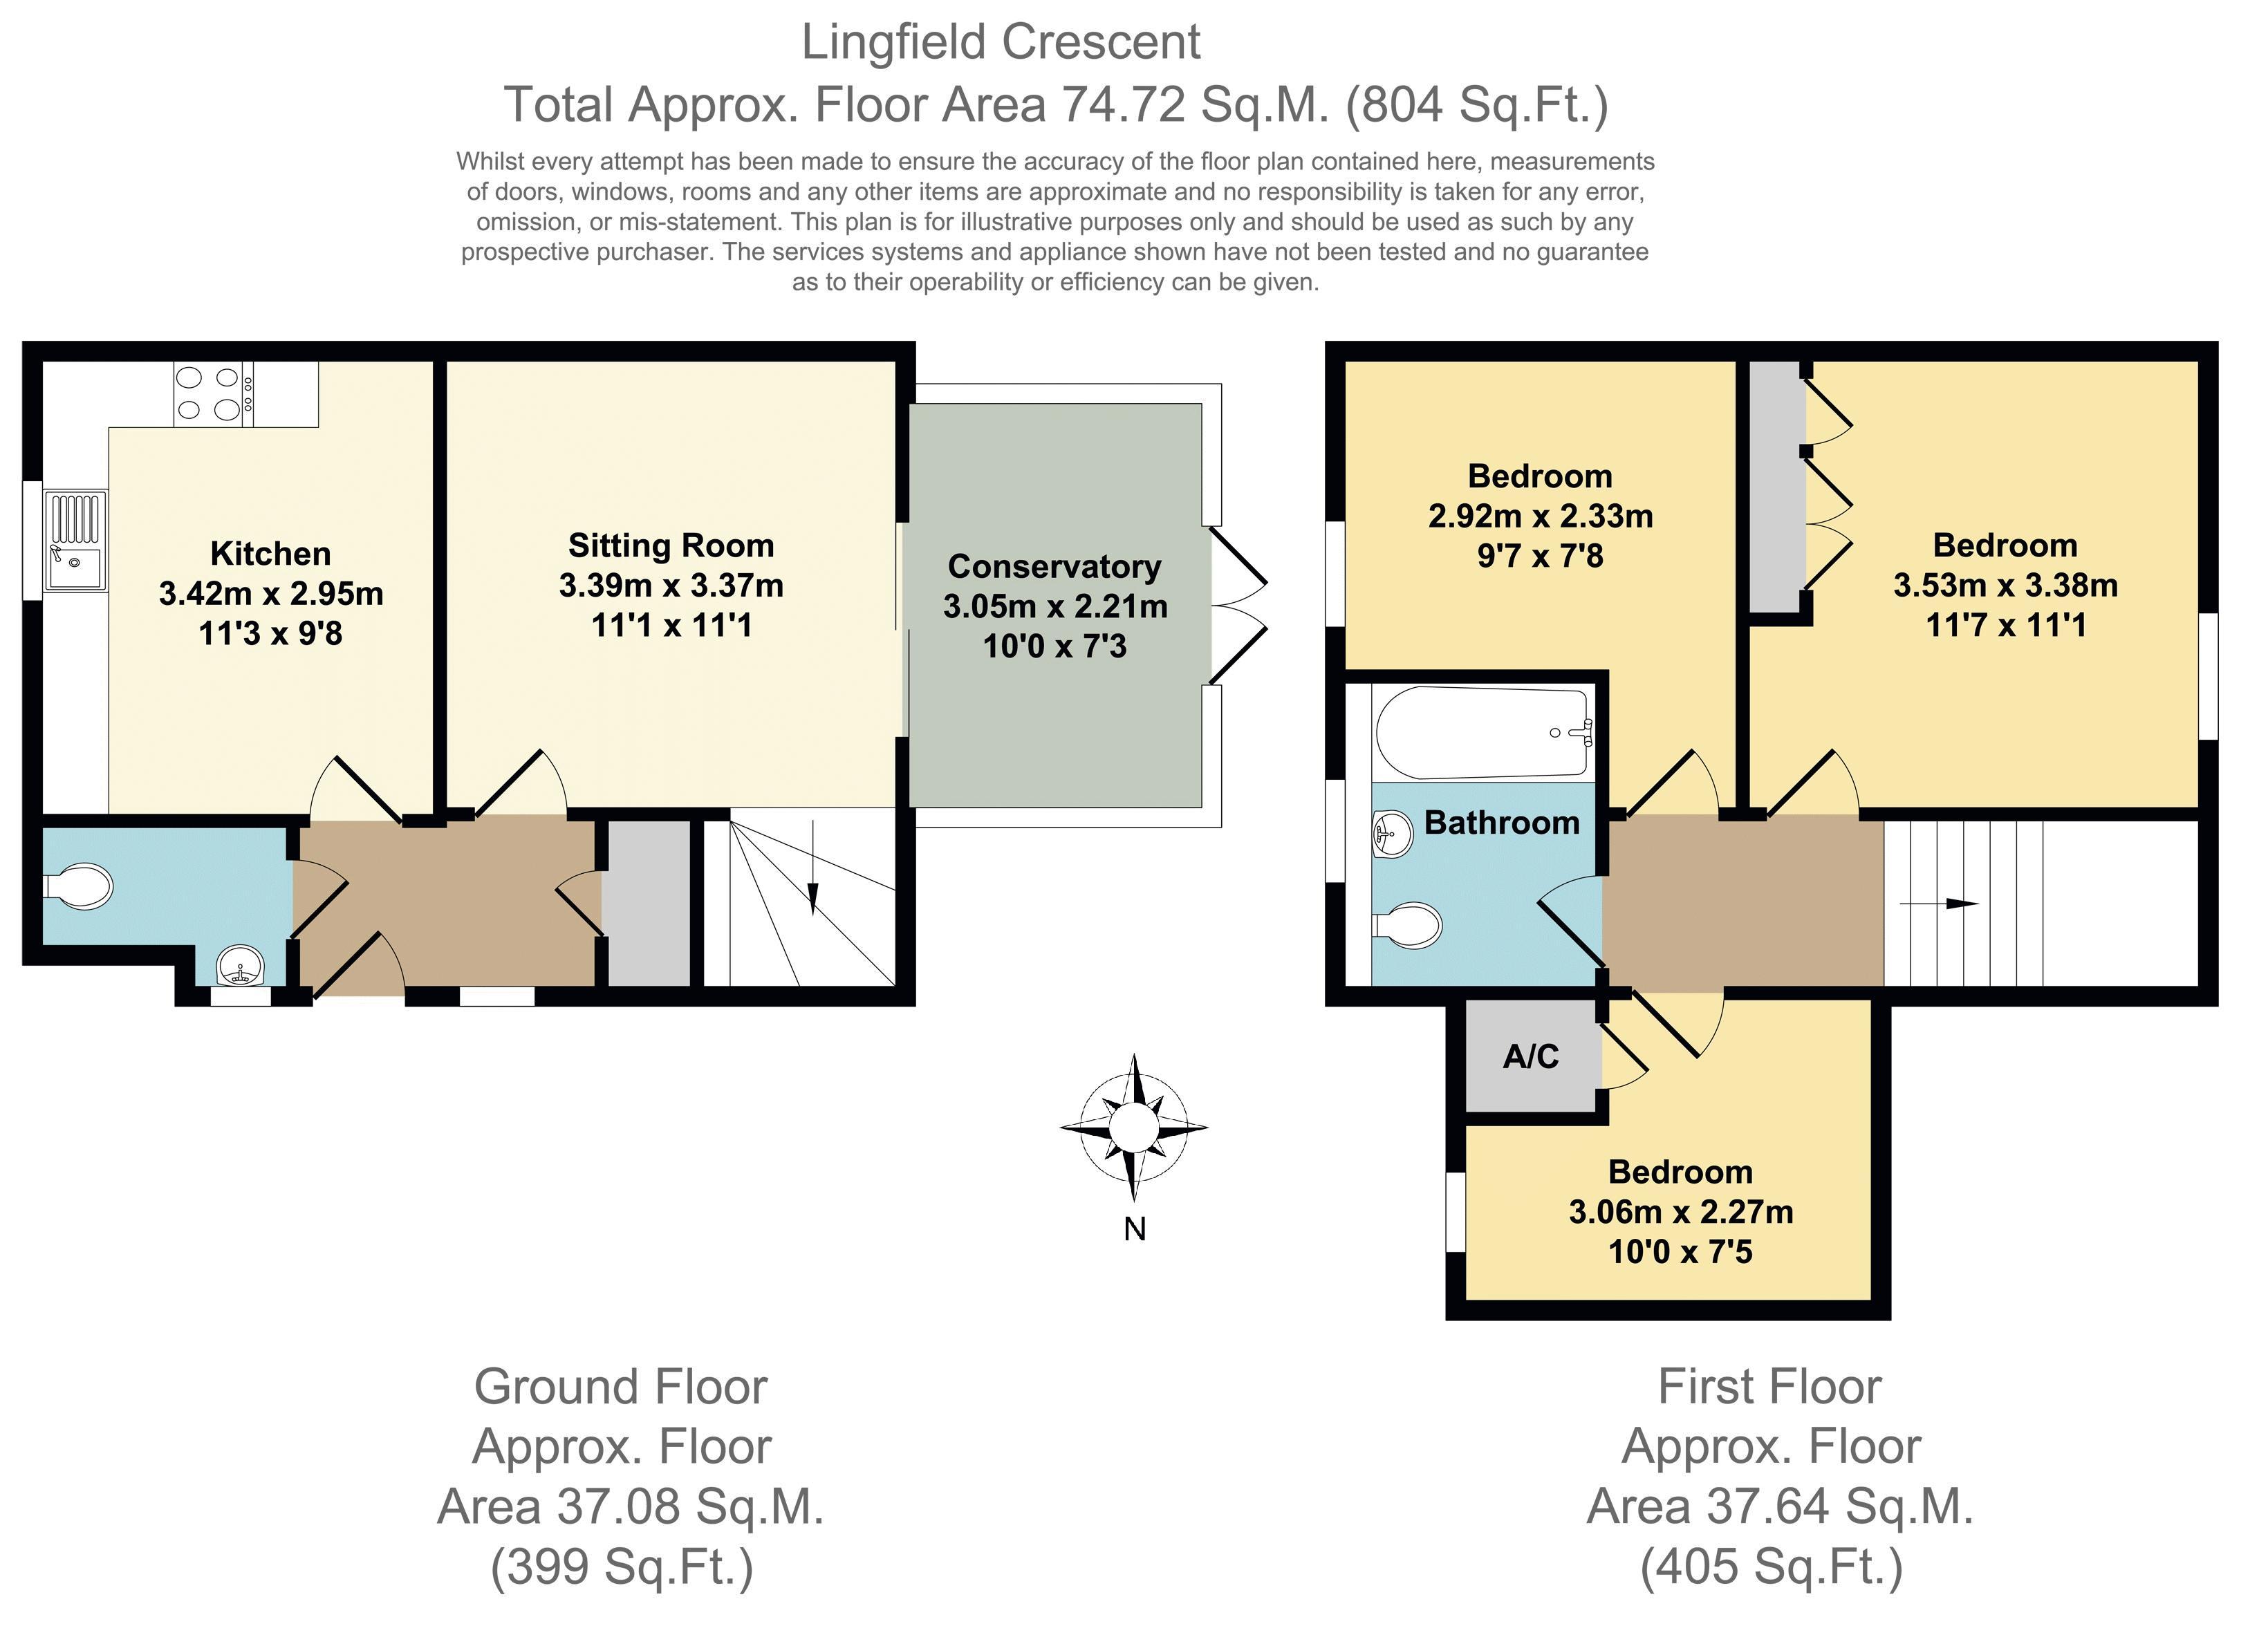 Lingfield Crescent, Stratford-Upon-Avon. Floorplan. .